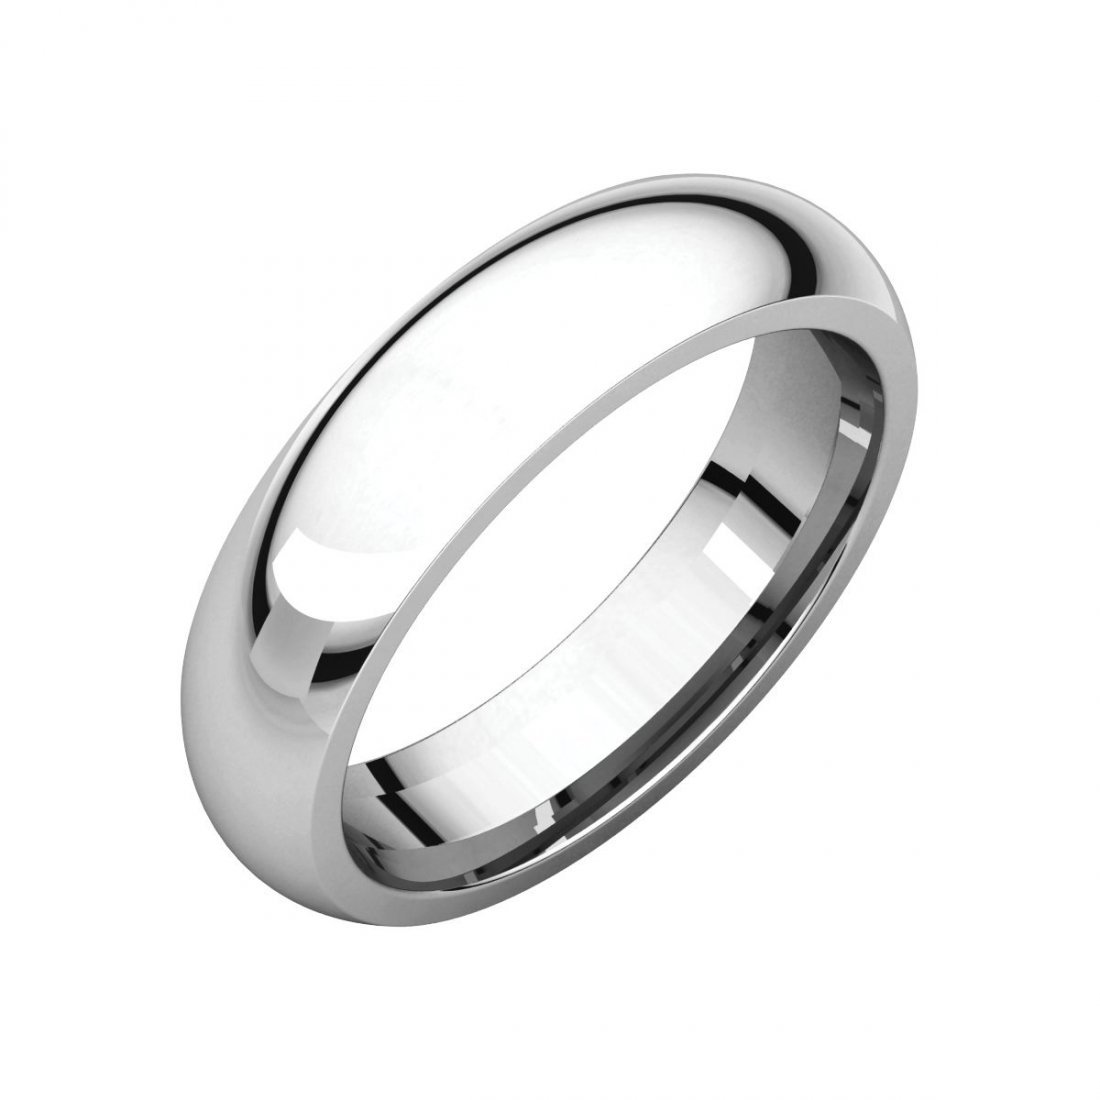 Ring - Platinum 5mm Comfort Fit Band